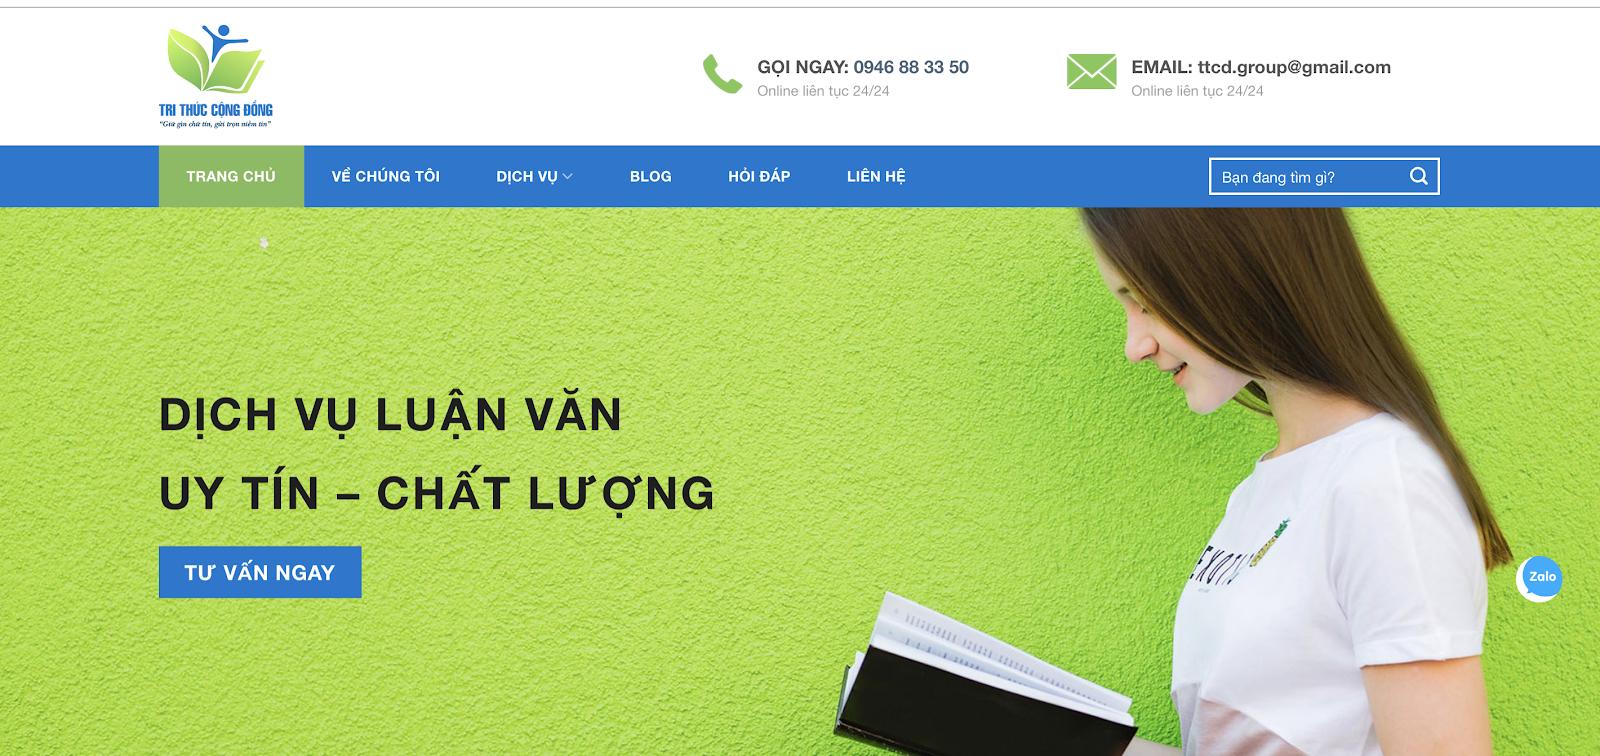 Trithuccongdong.com